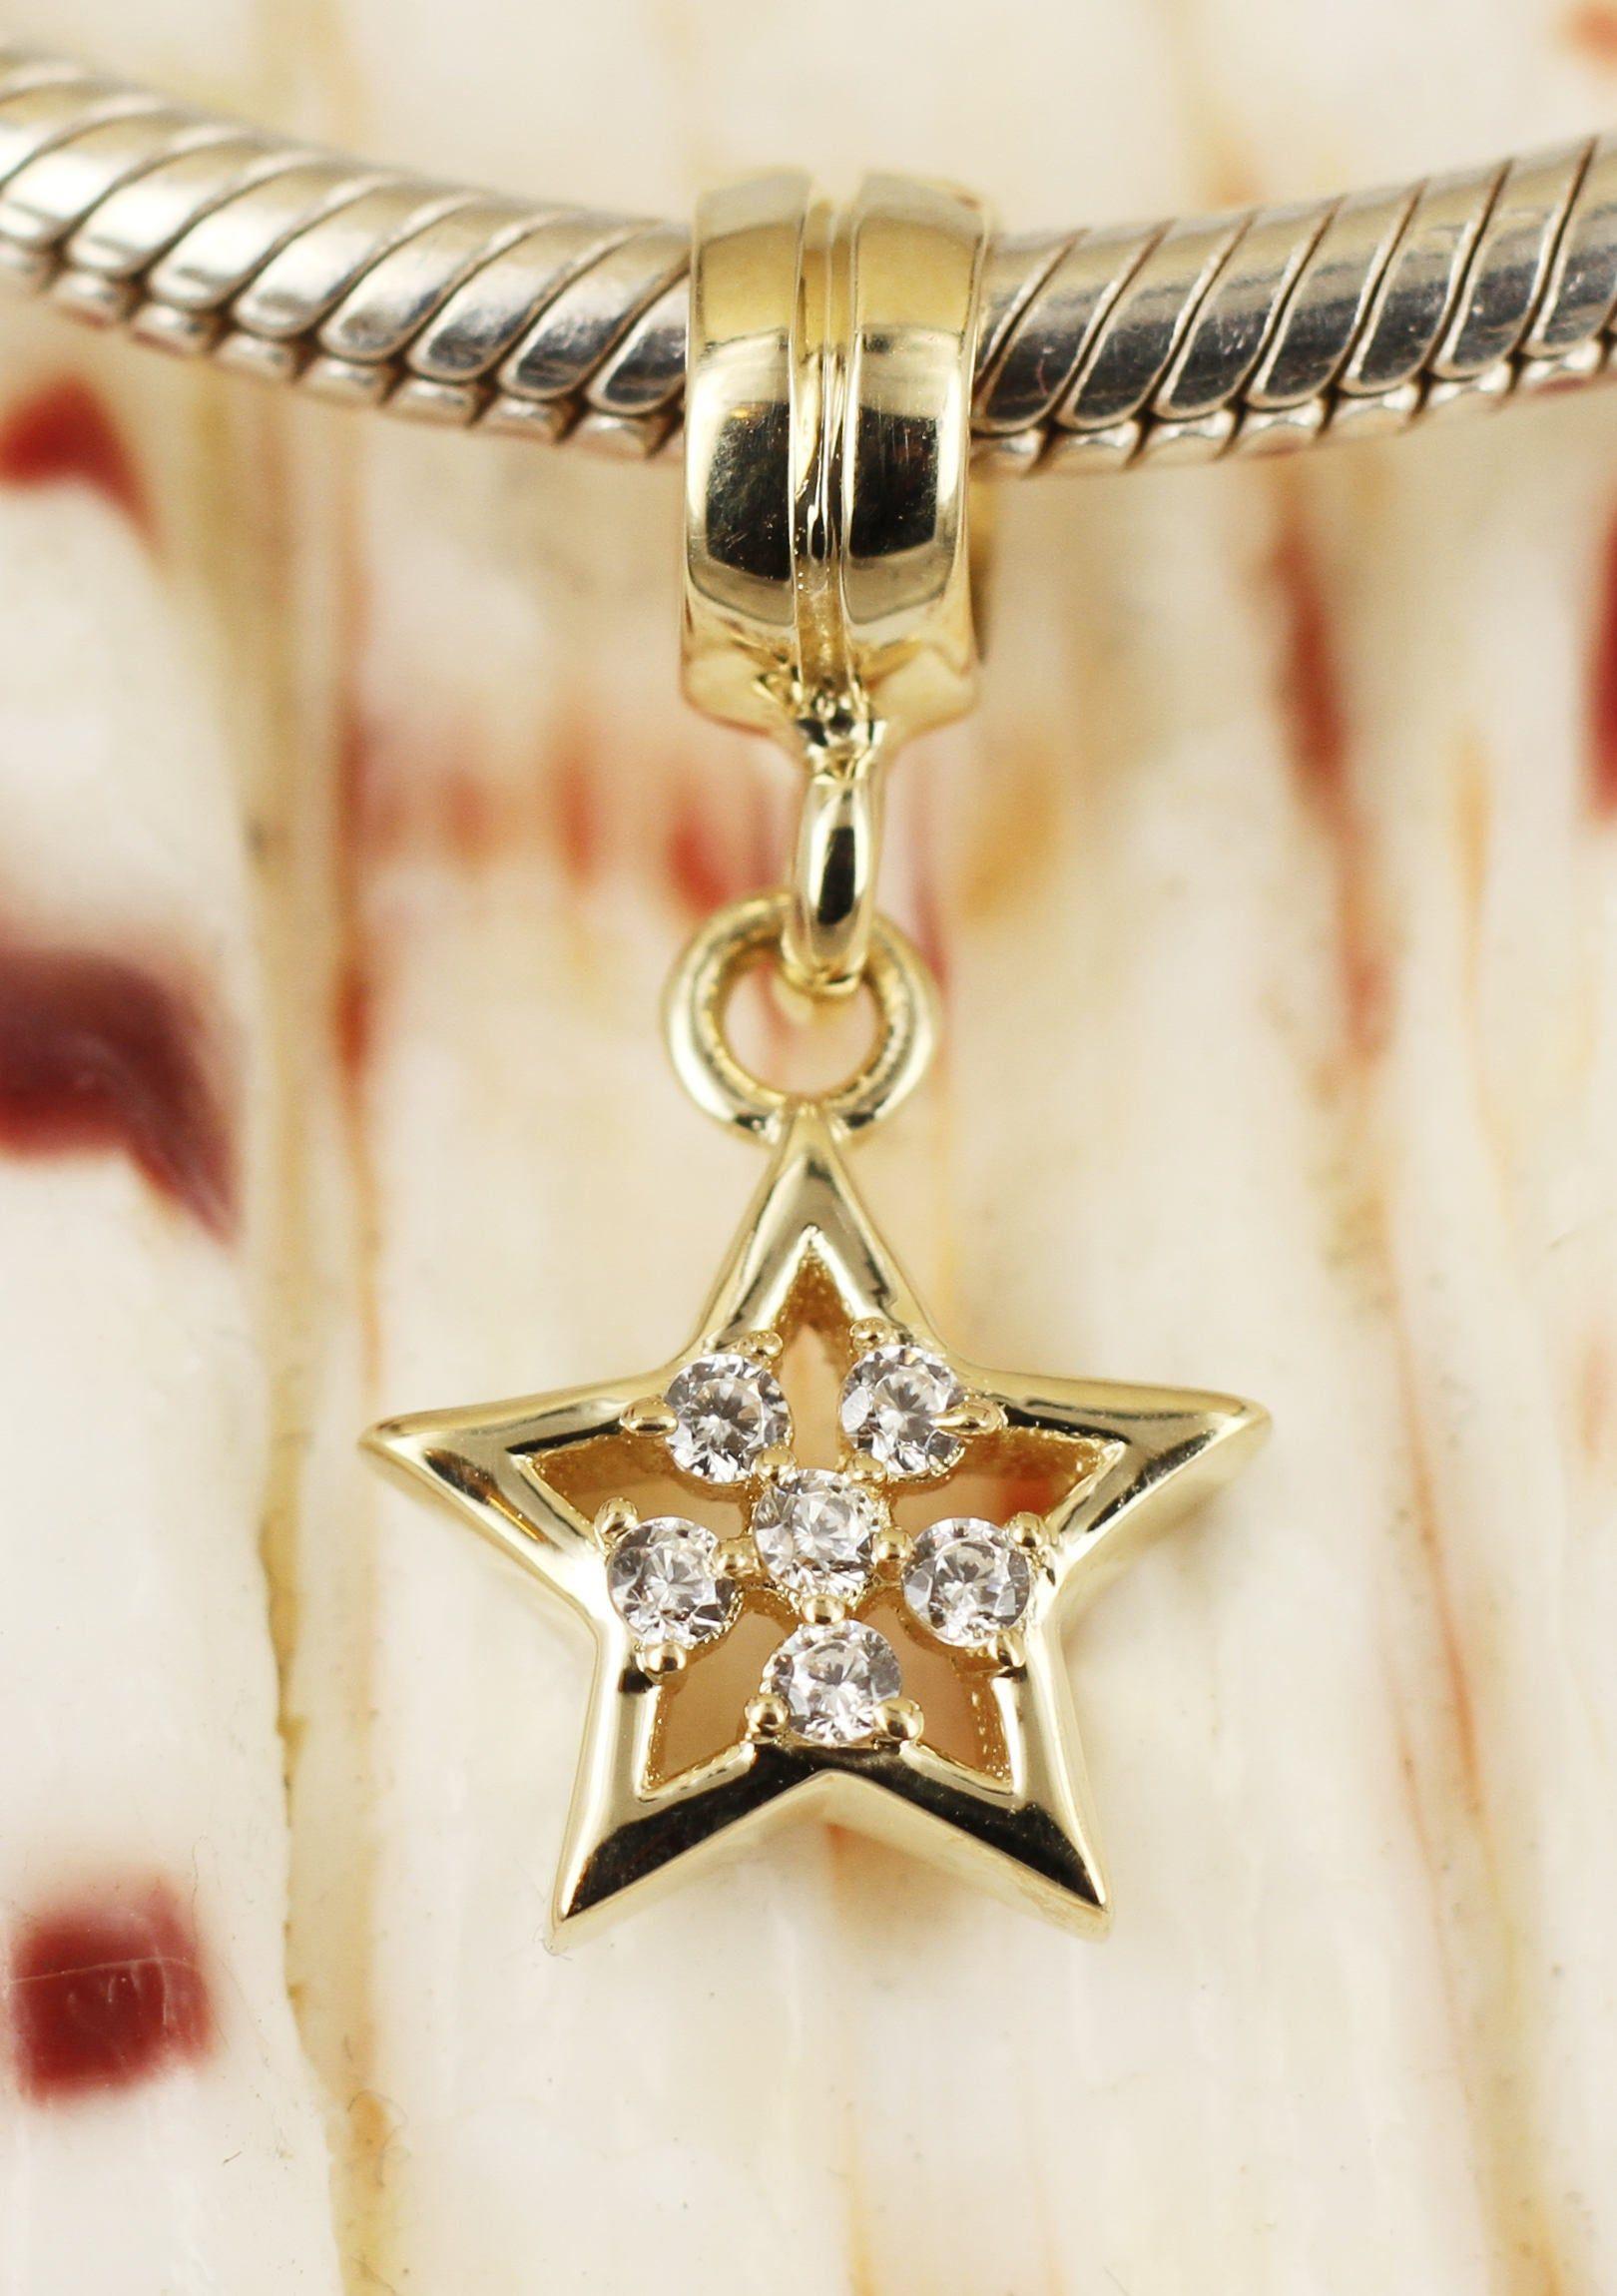 Necklace Vermeil GOLD Sterling Silver Bar Dangle BEAD Fits Charm Bracelet